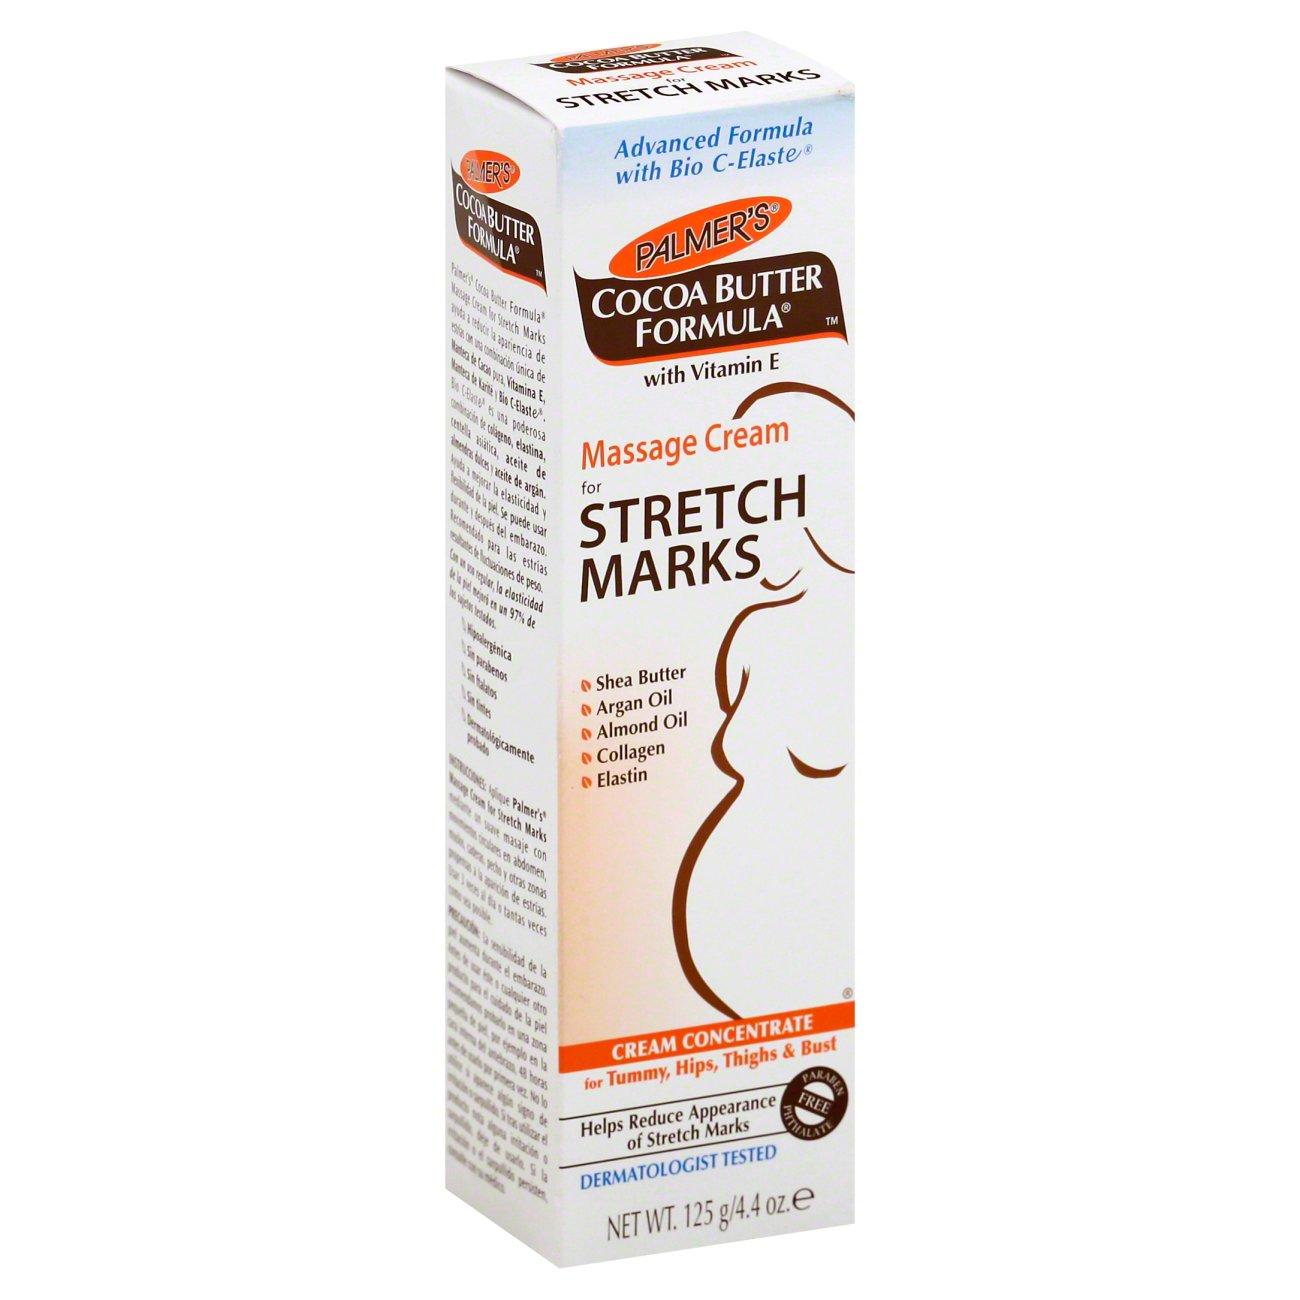 Palmer S Cocoa Butter Formula Massage Cream For Stretch Marks